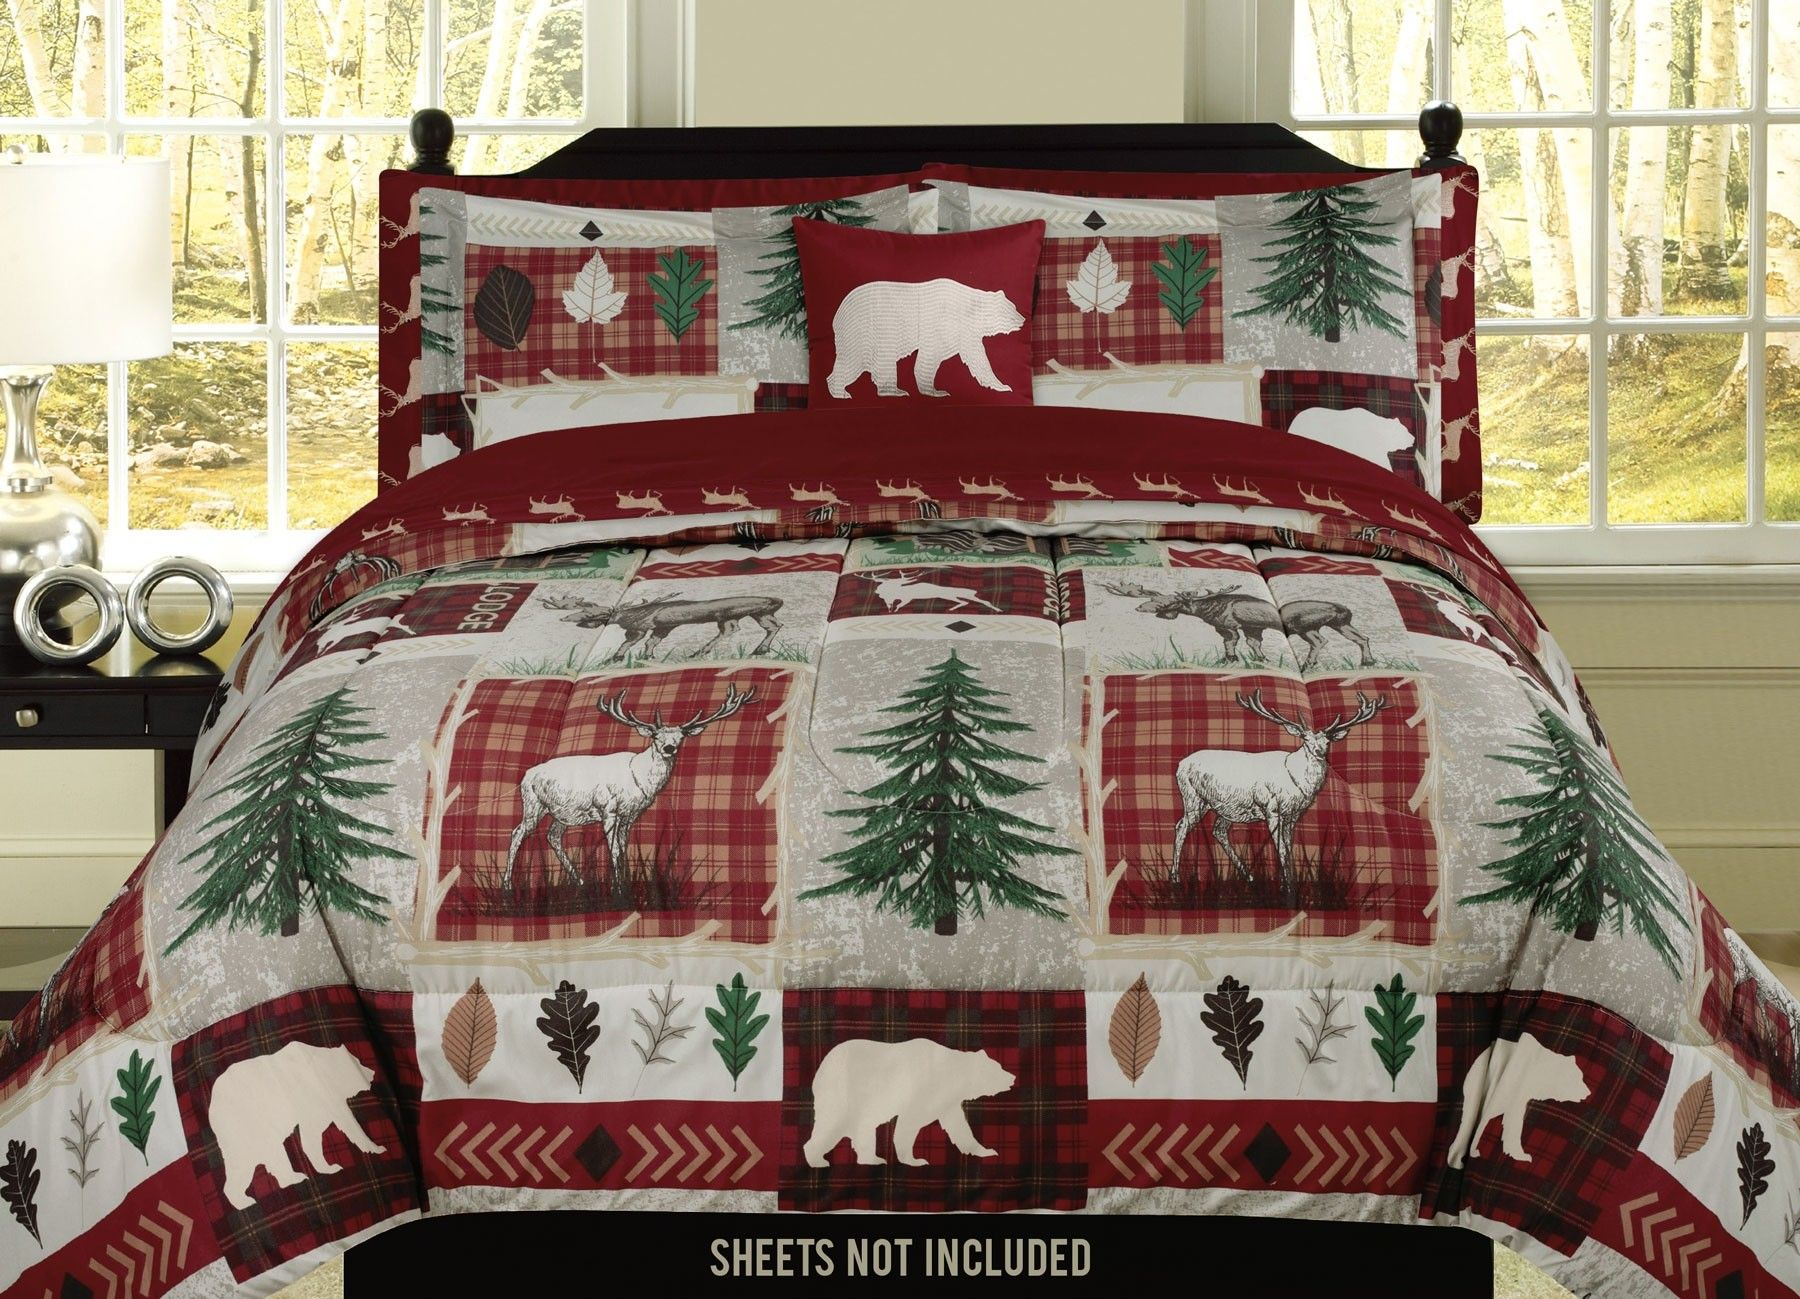 co gardens clover set and king bedding sets better comforters piece homes walmart cabins sheet comforter asli cabin aetherair